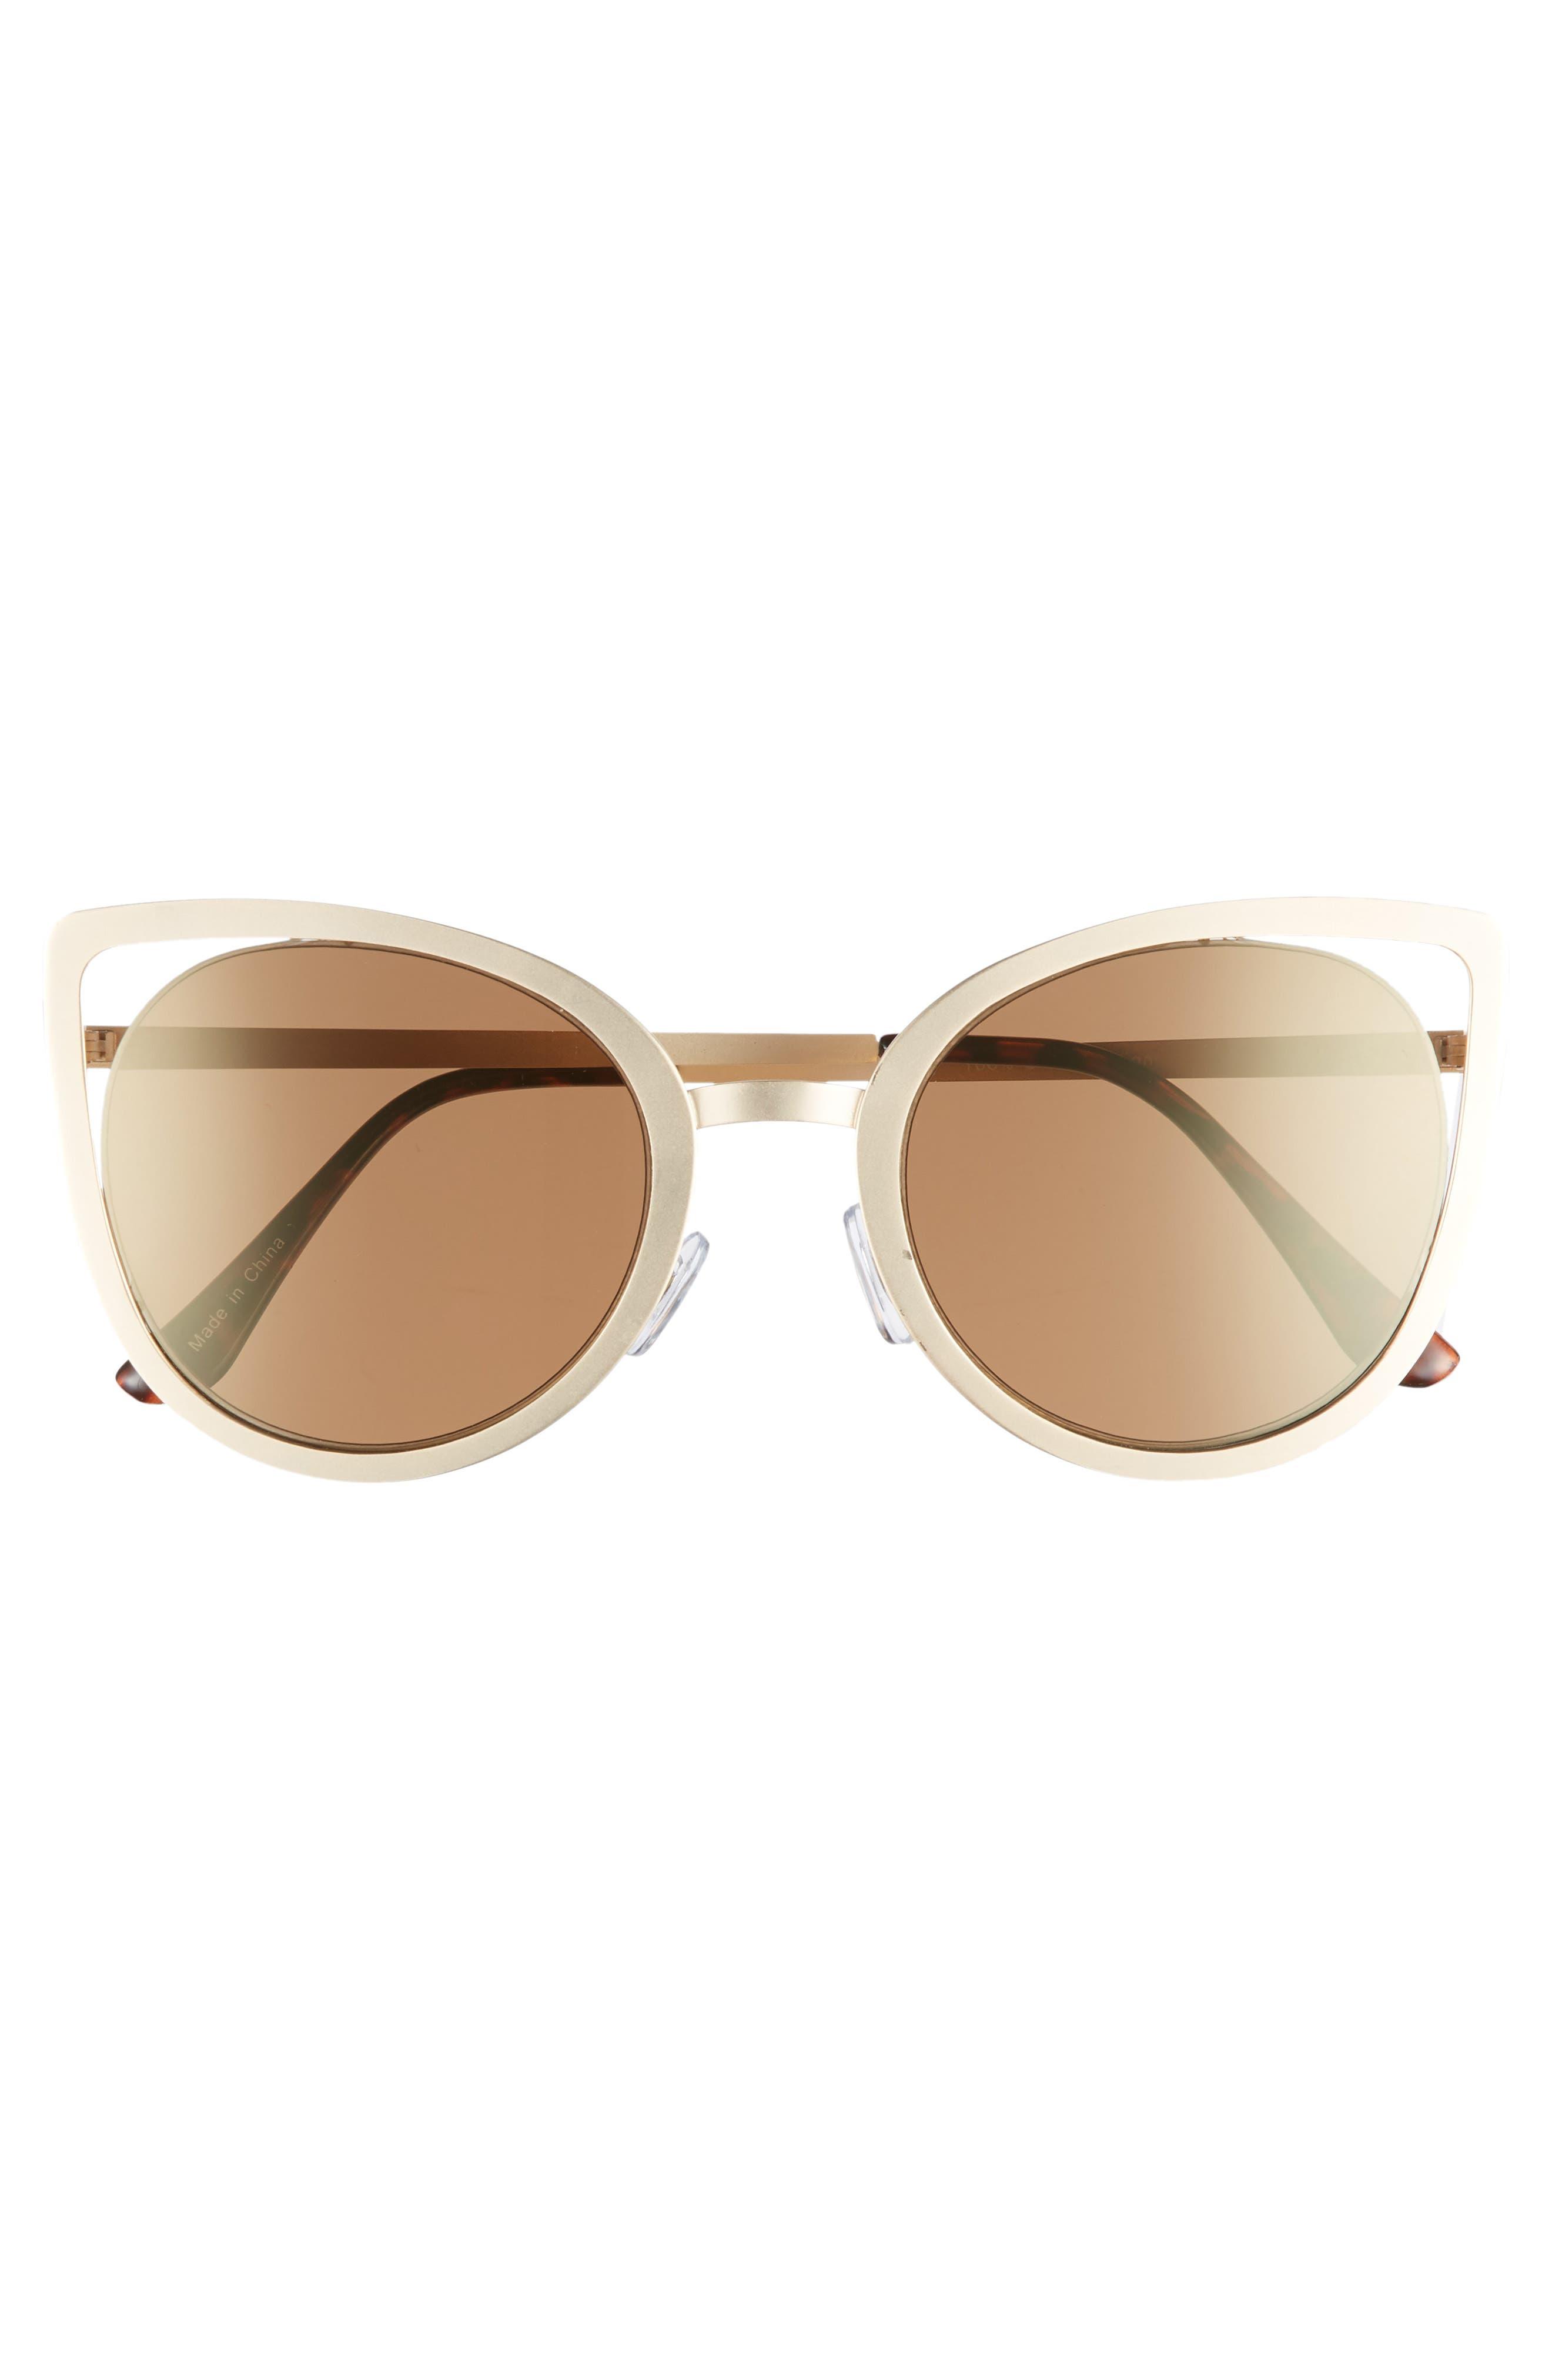 53mm Cutout Cat Eye Sunglasses,                             Alternate thumbnail 3, color,                             Gold